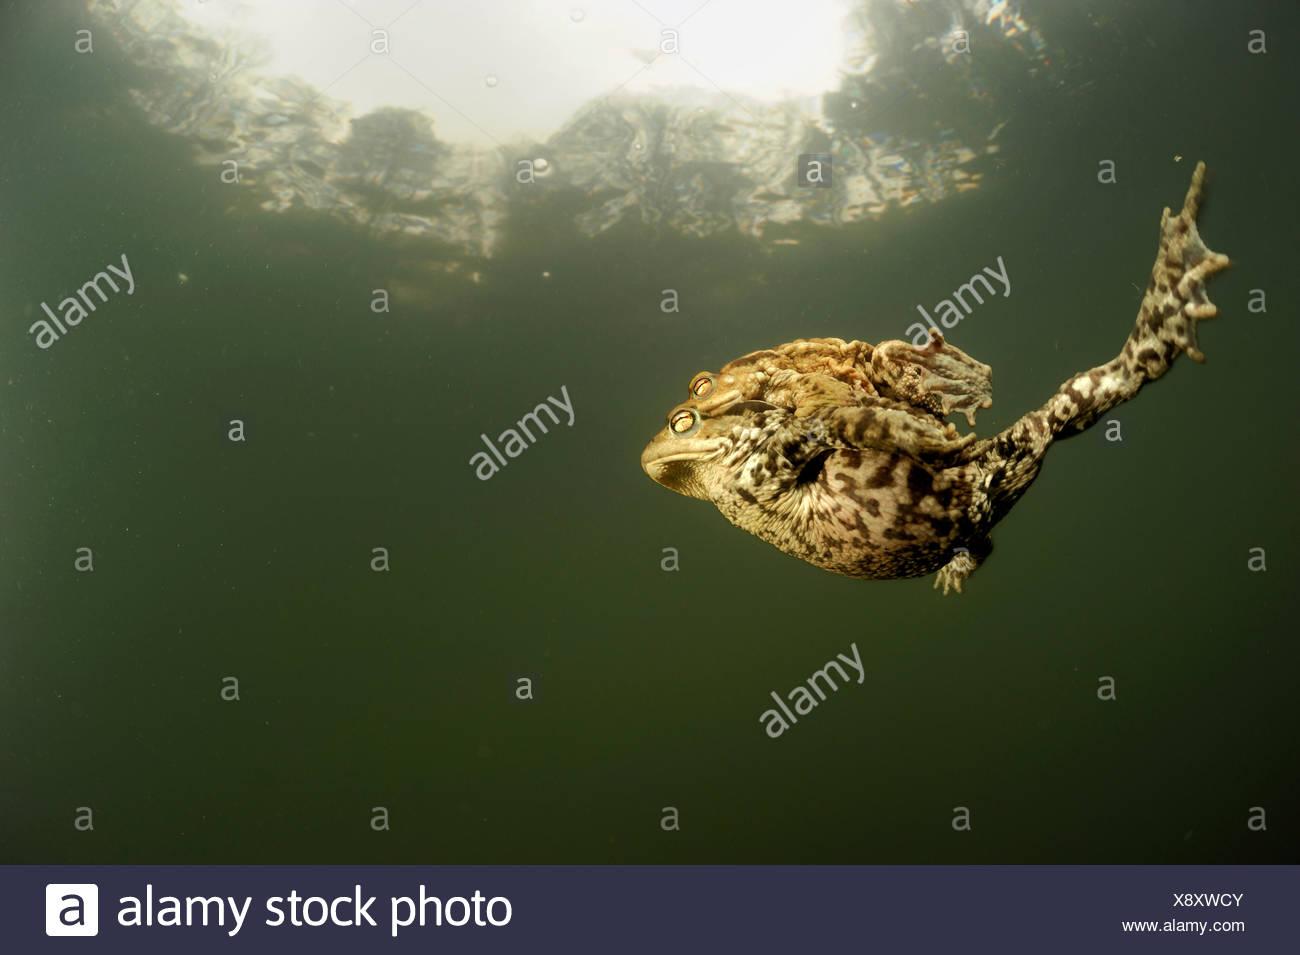 Par de sapos común europeo (Bufo bufo) nadan juntos en un estanque, Alemania Imagen De Stock